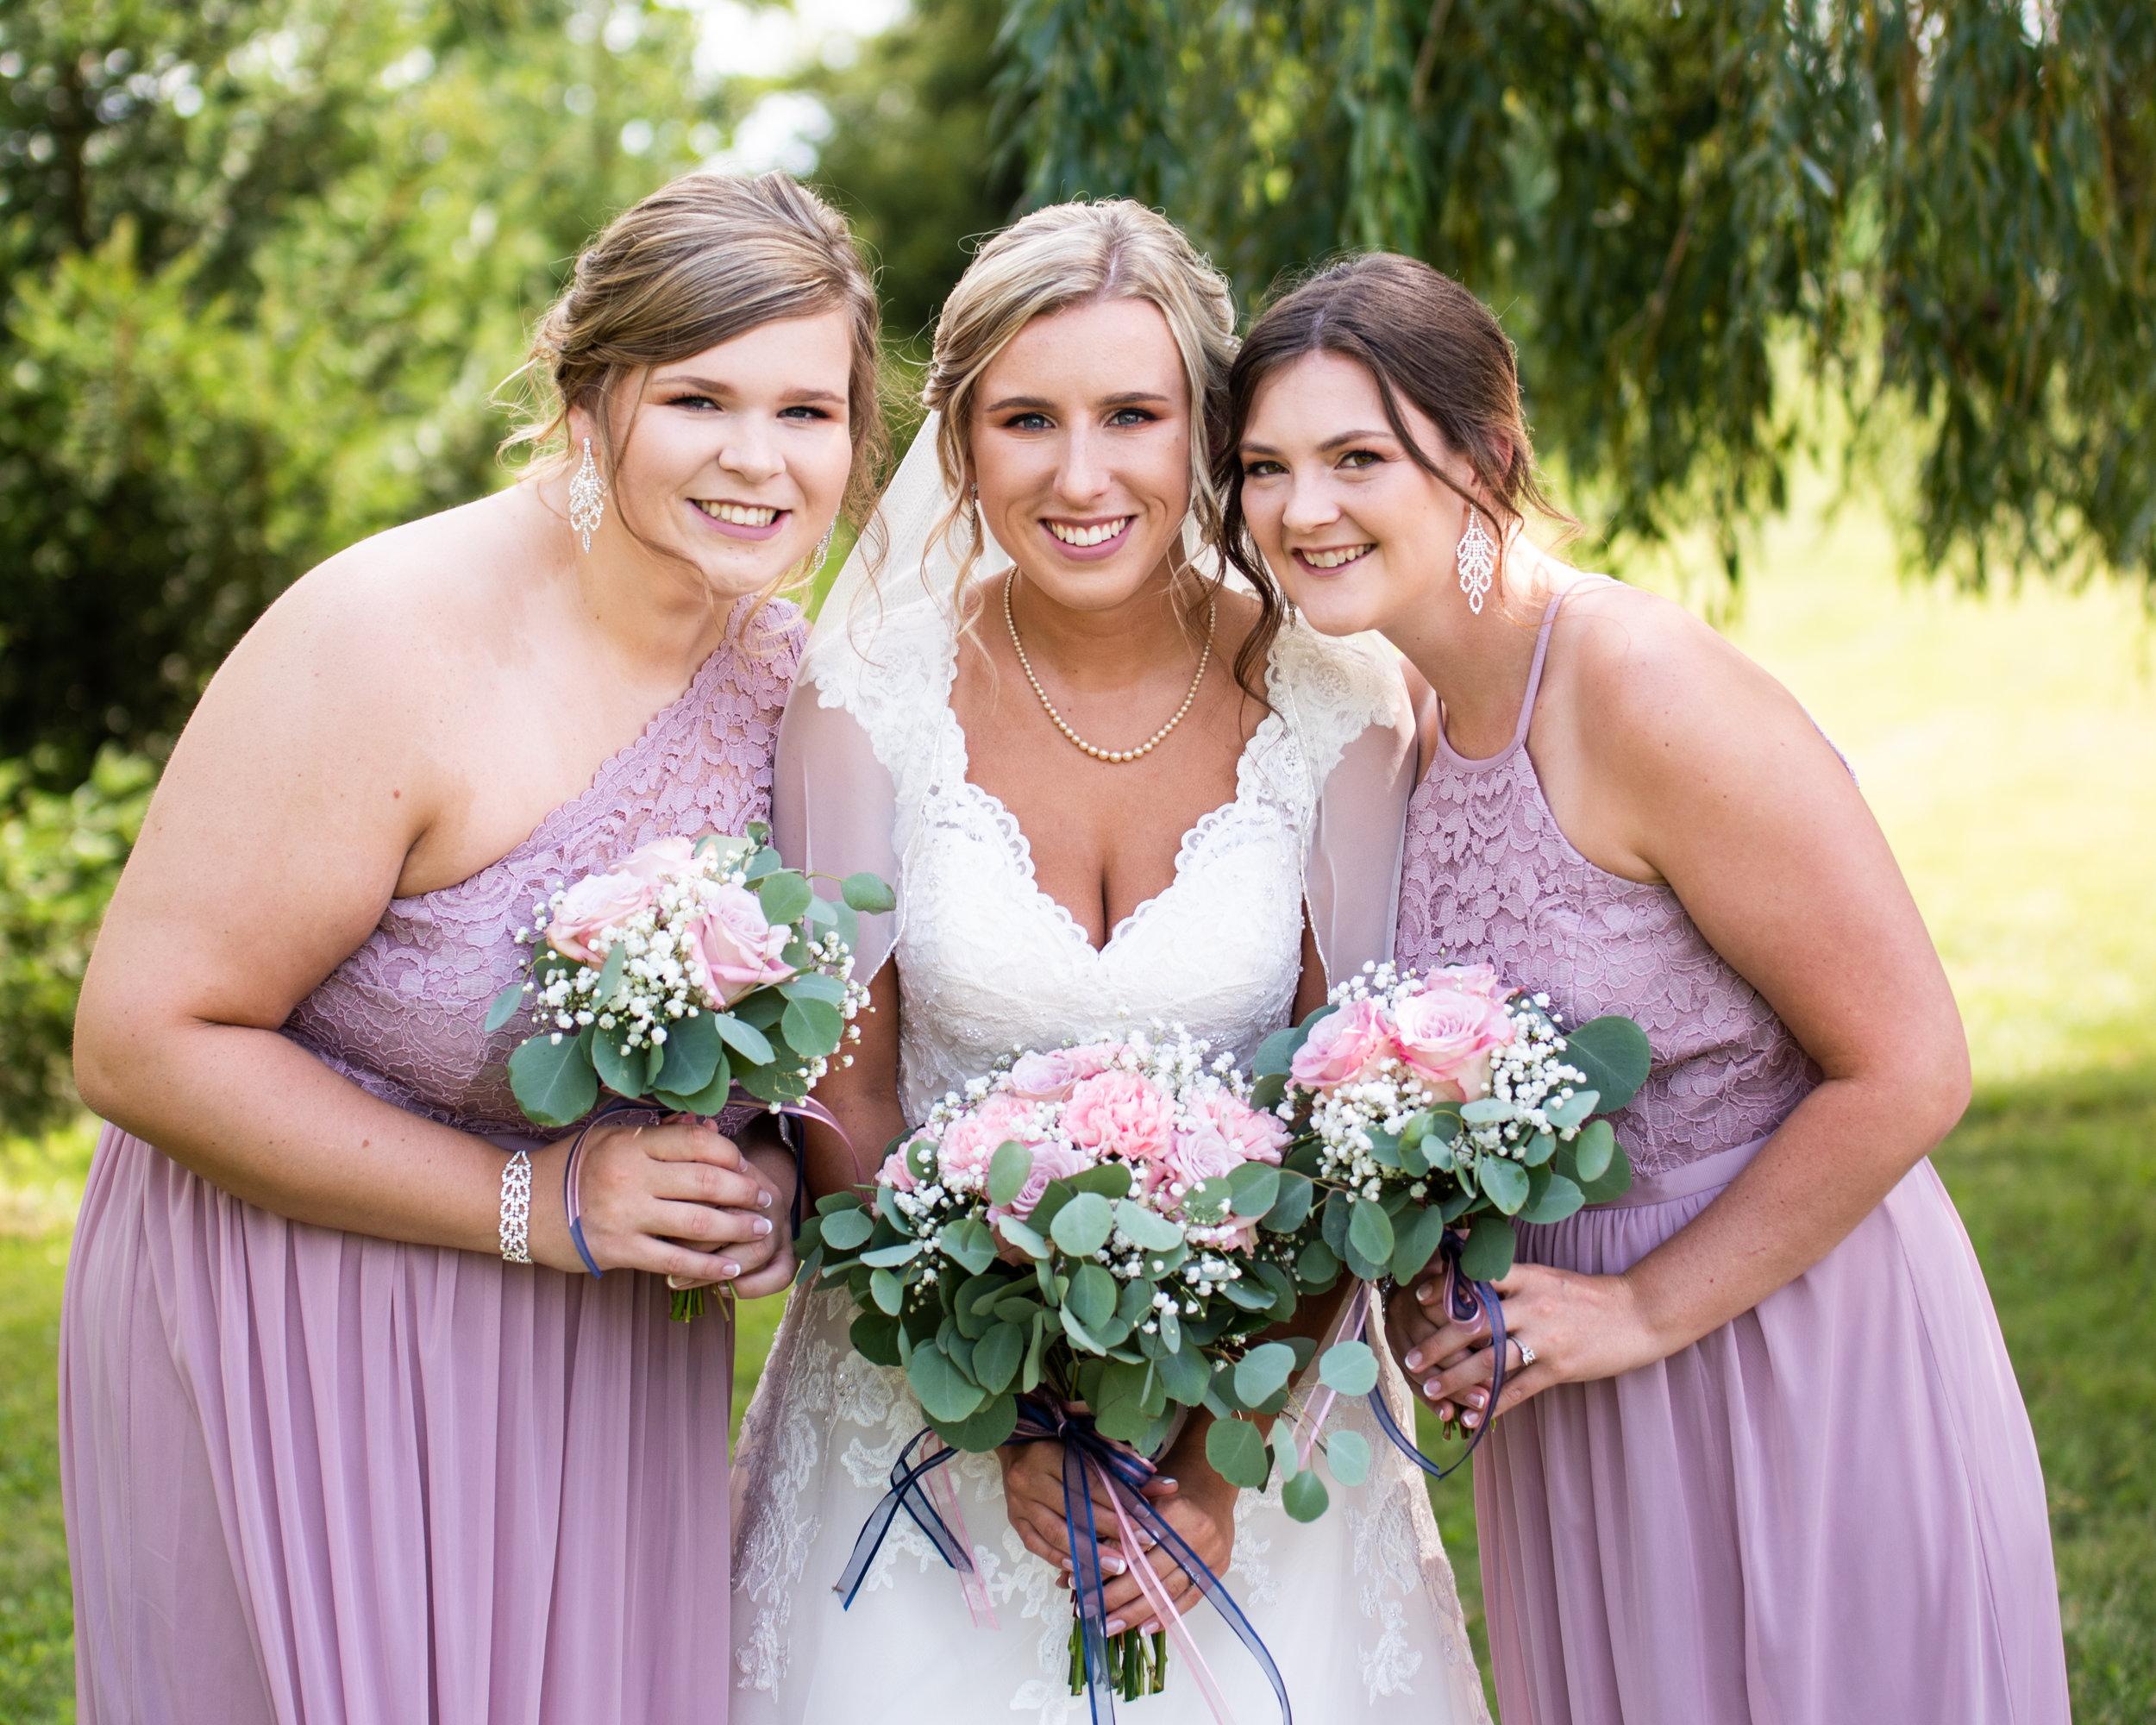 wedding (1 of 1)-24.jpg